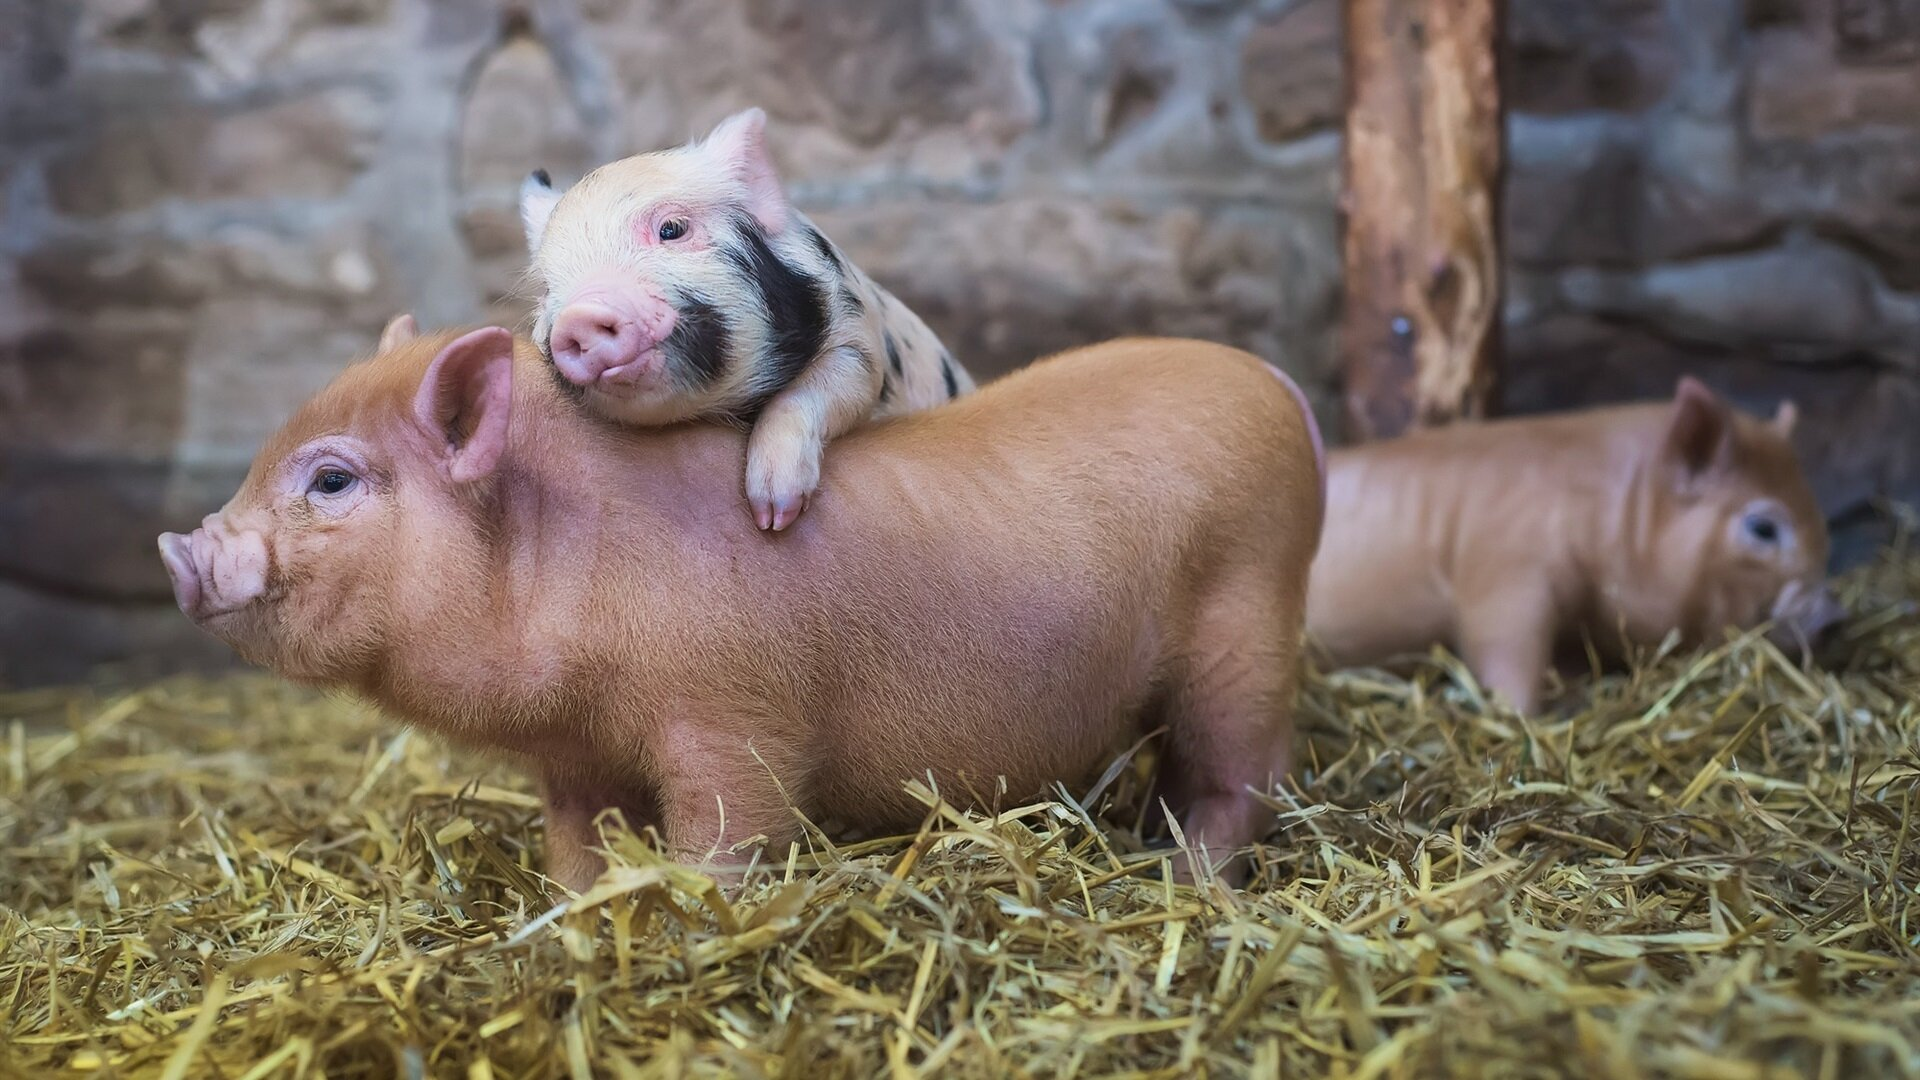 Свинка, свинка, не болей! - фото pic_b3a9bea262add72e238de8529176d2a2_1920x9000_1.jpg